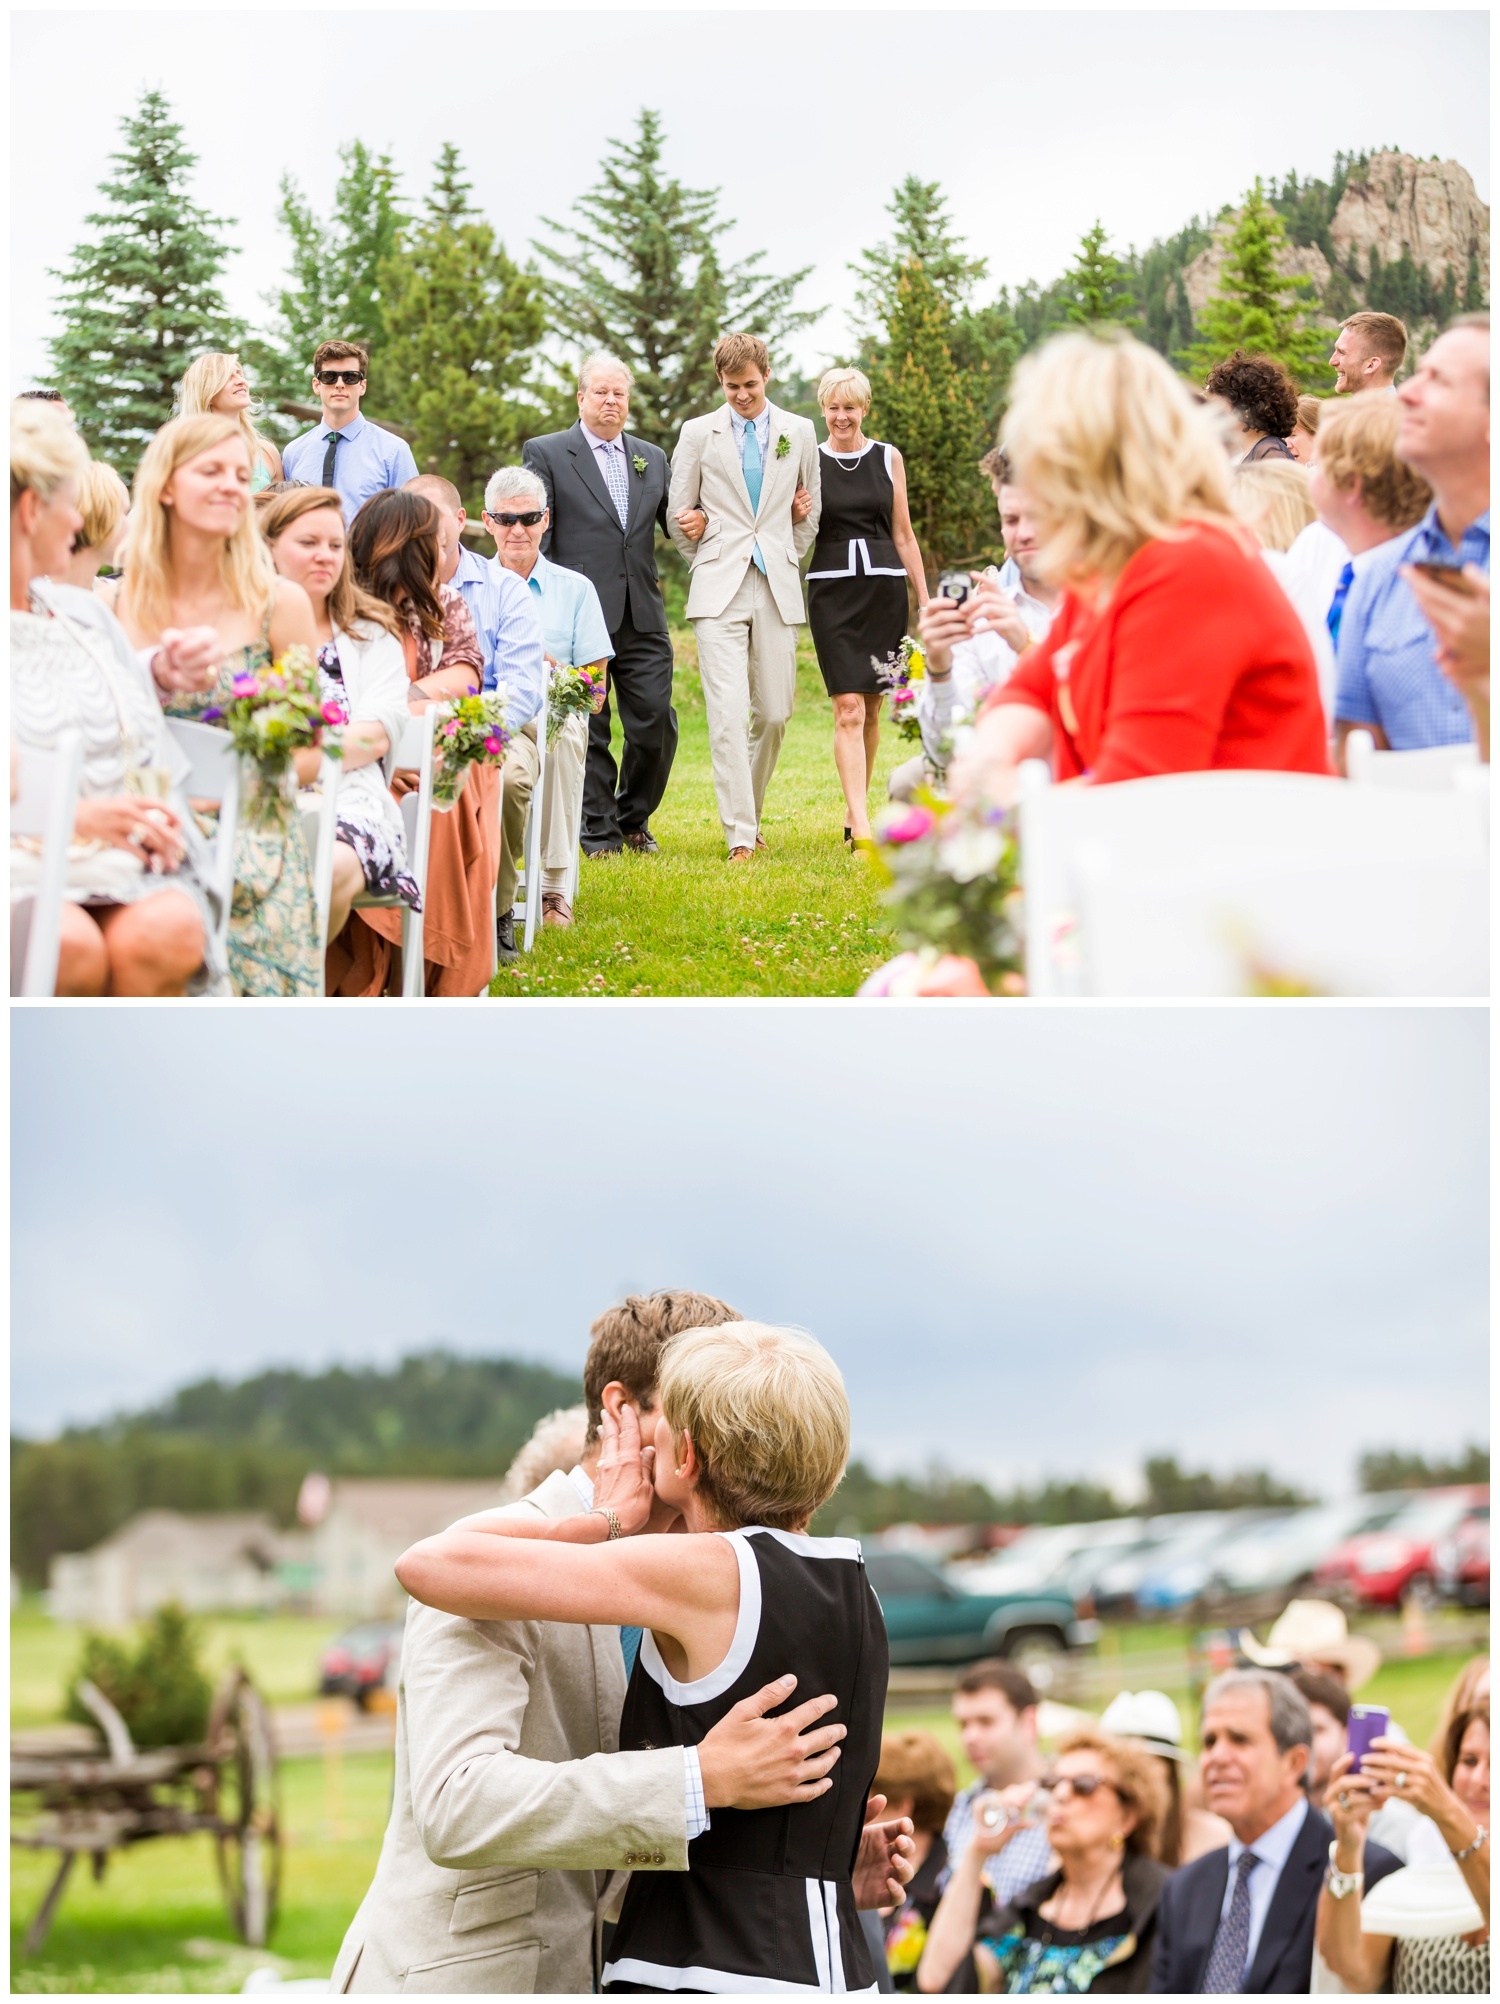 evergreen wedding photography010.jpg